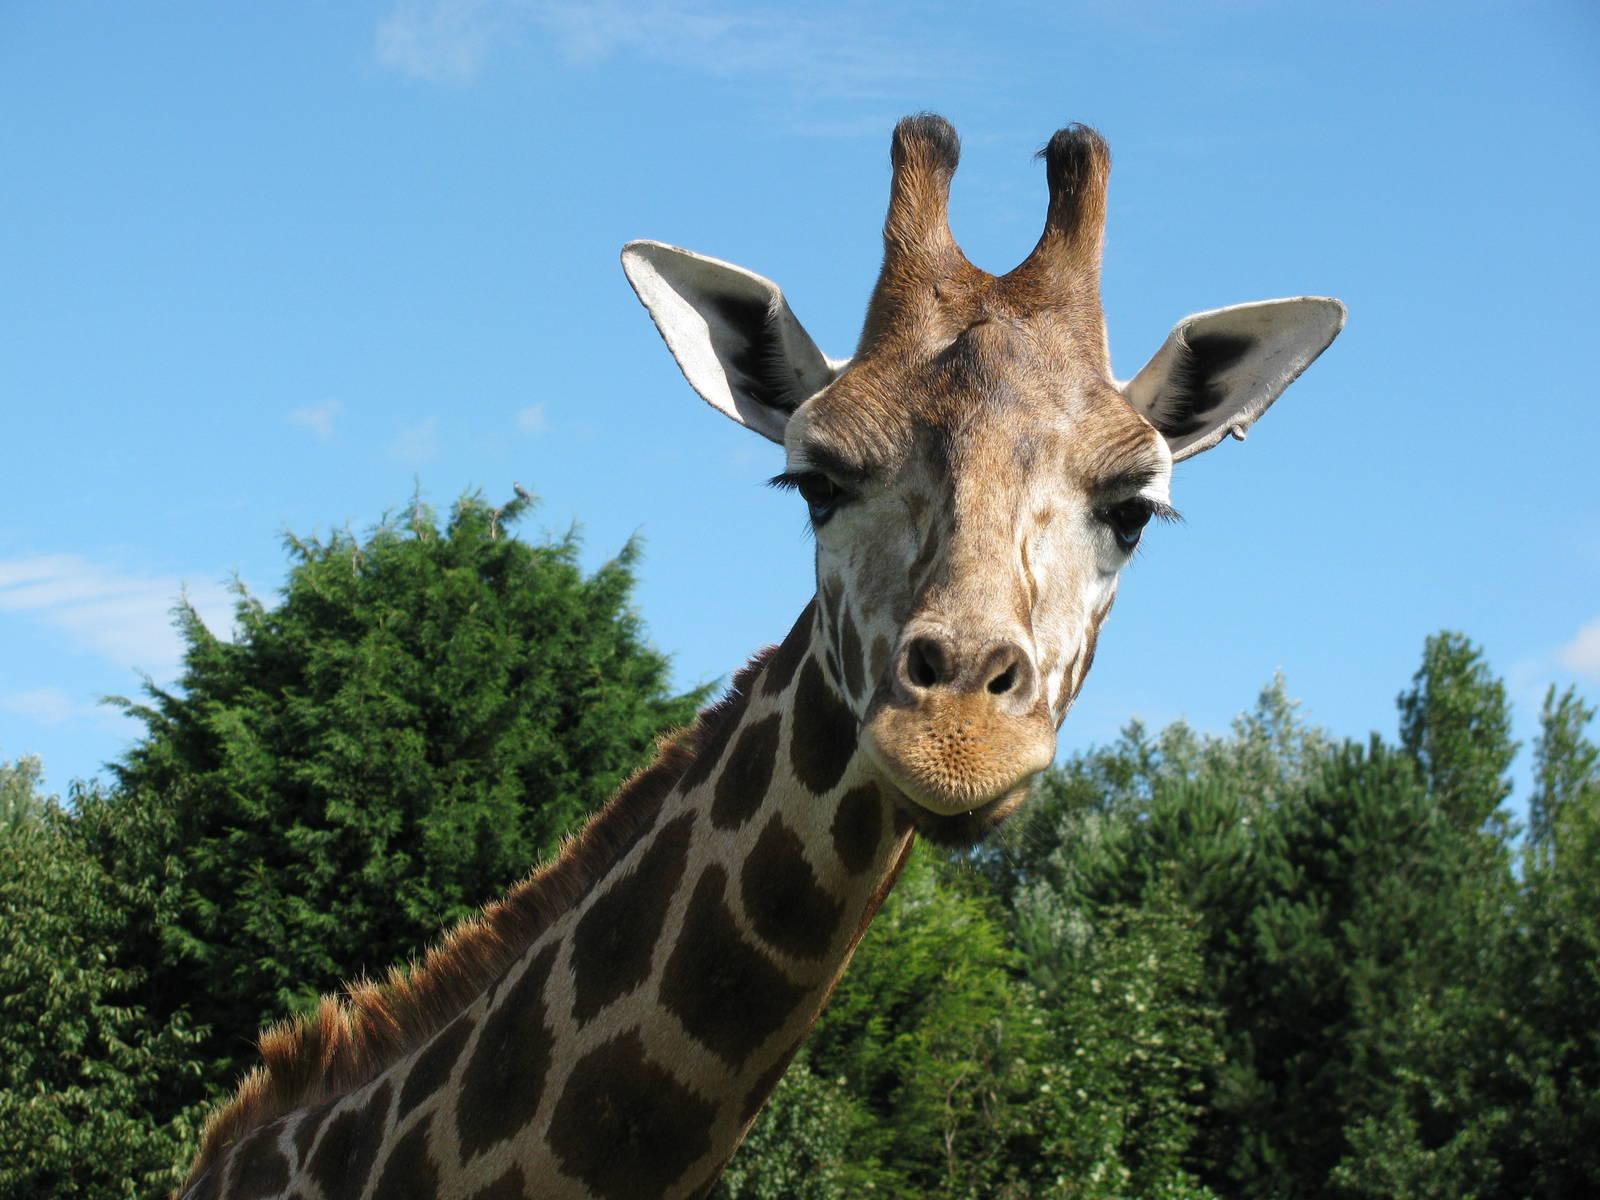 images of giraffes